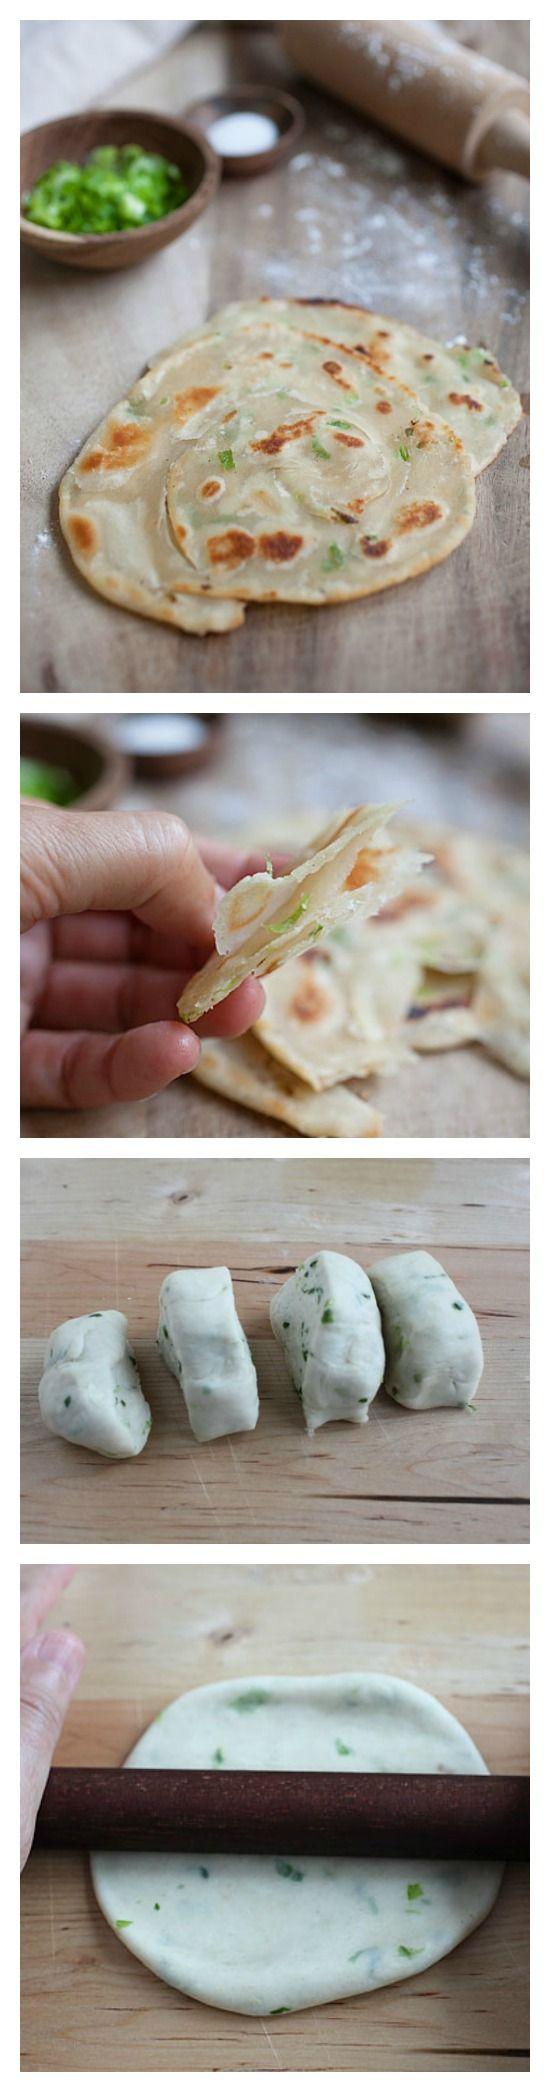 how to make 4 6 pancakes